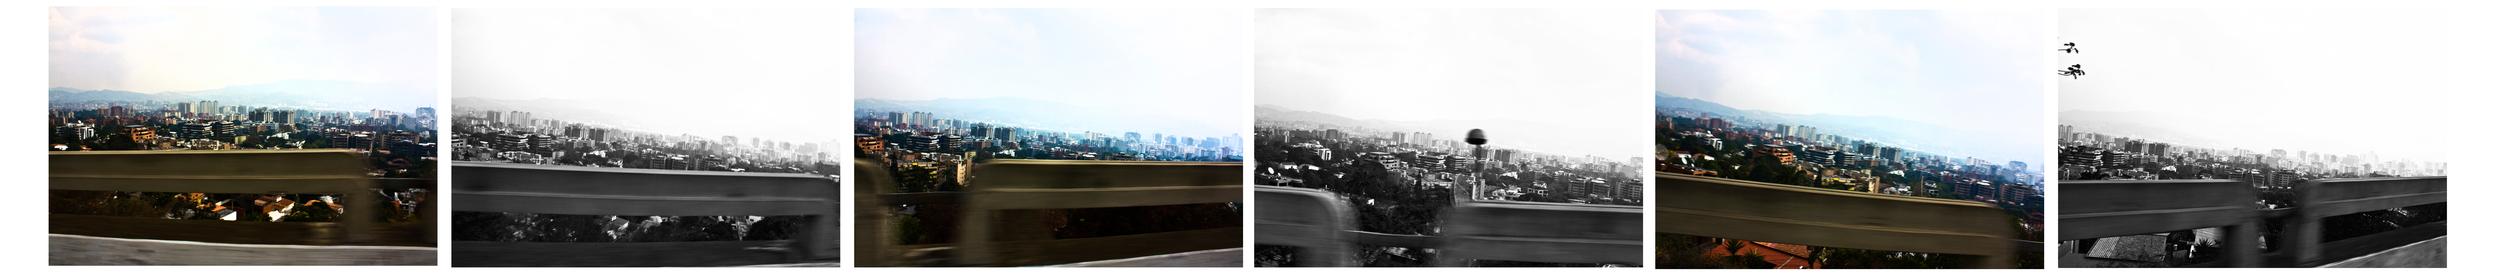 VZ_CaracasSkylineDriving Montage (1).jpg